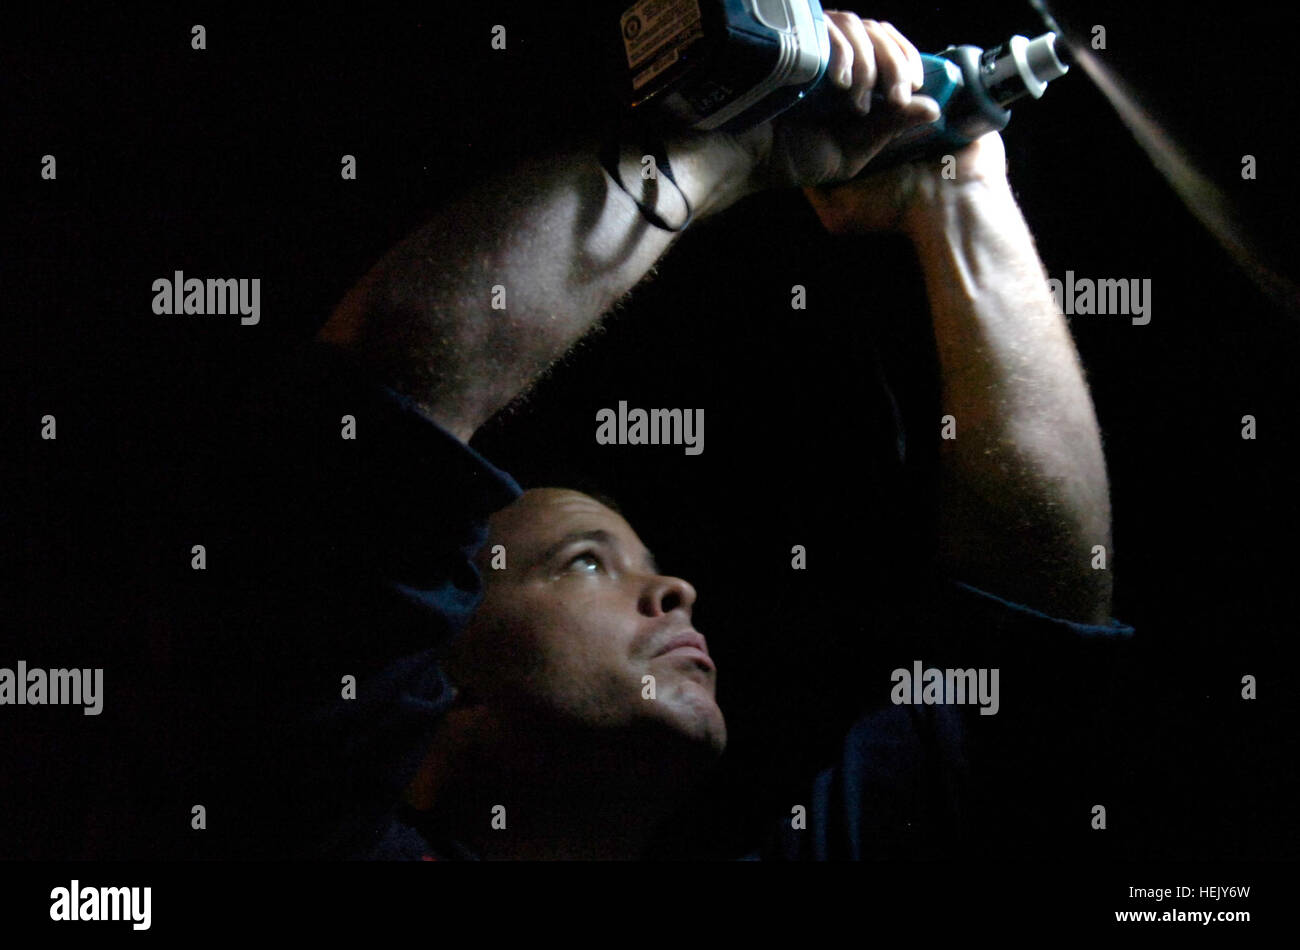 Navy Petty Officer 3rd Class Robert Hicks, an aviation structural mechanic, performs maintenance on a timer check Stock Photo